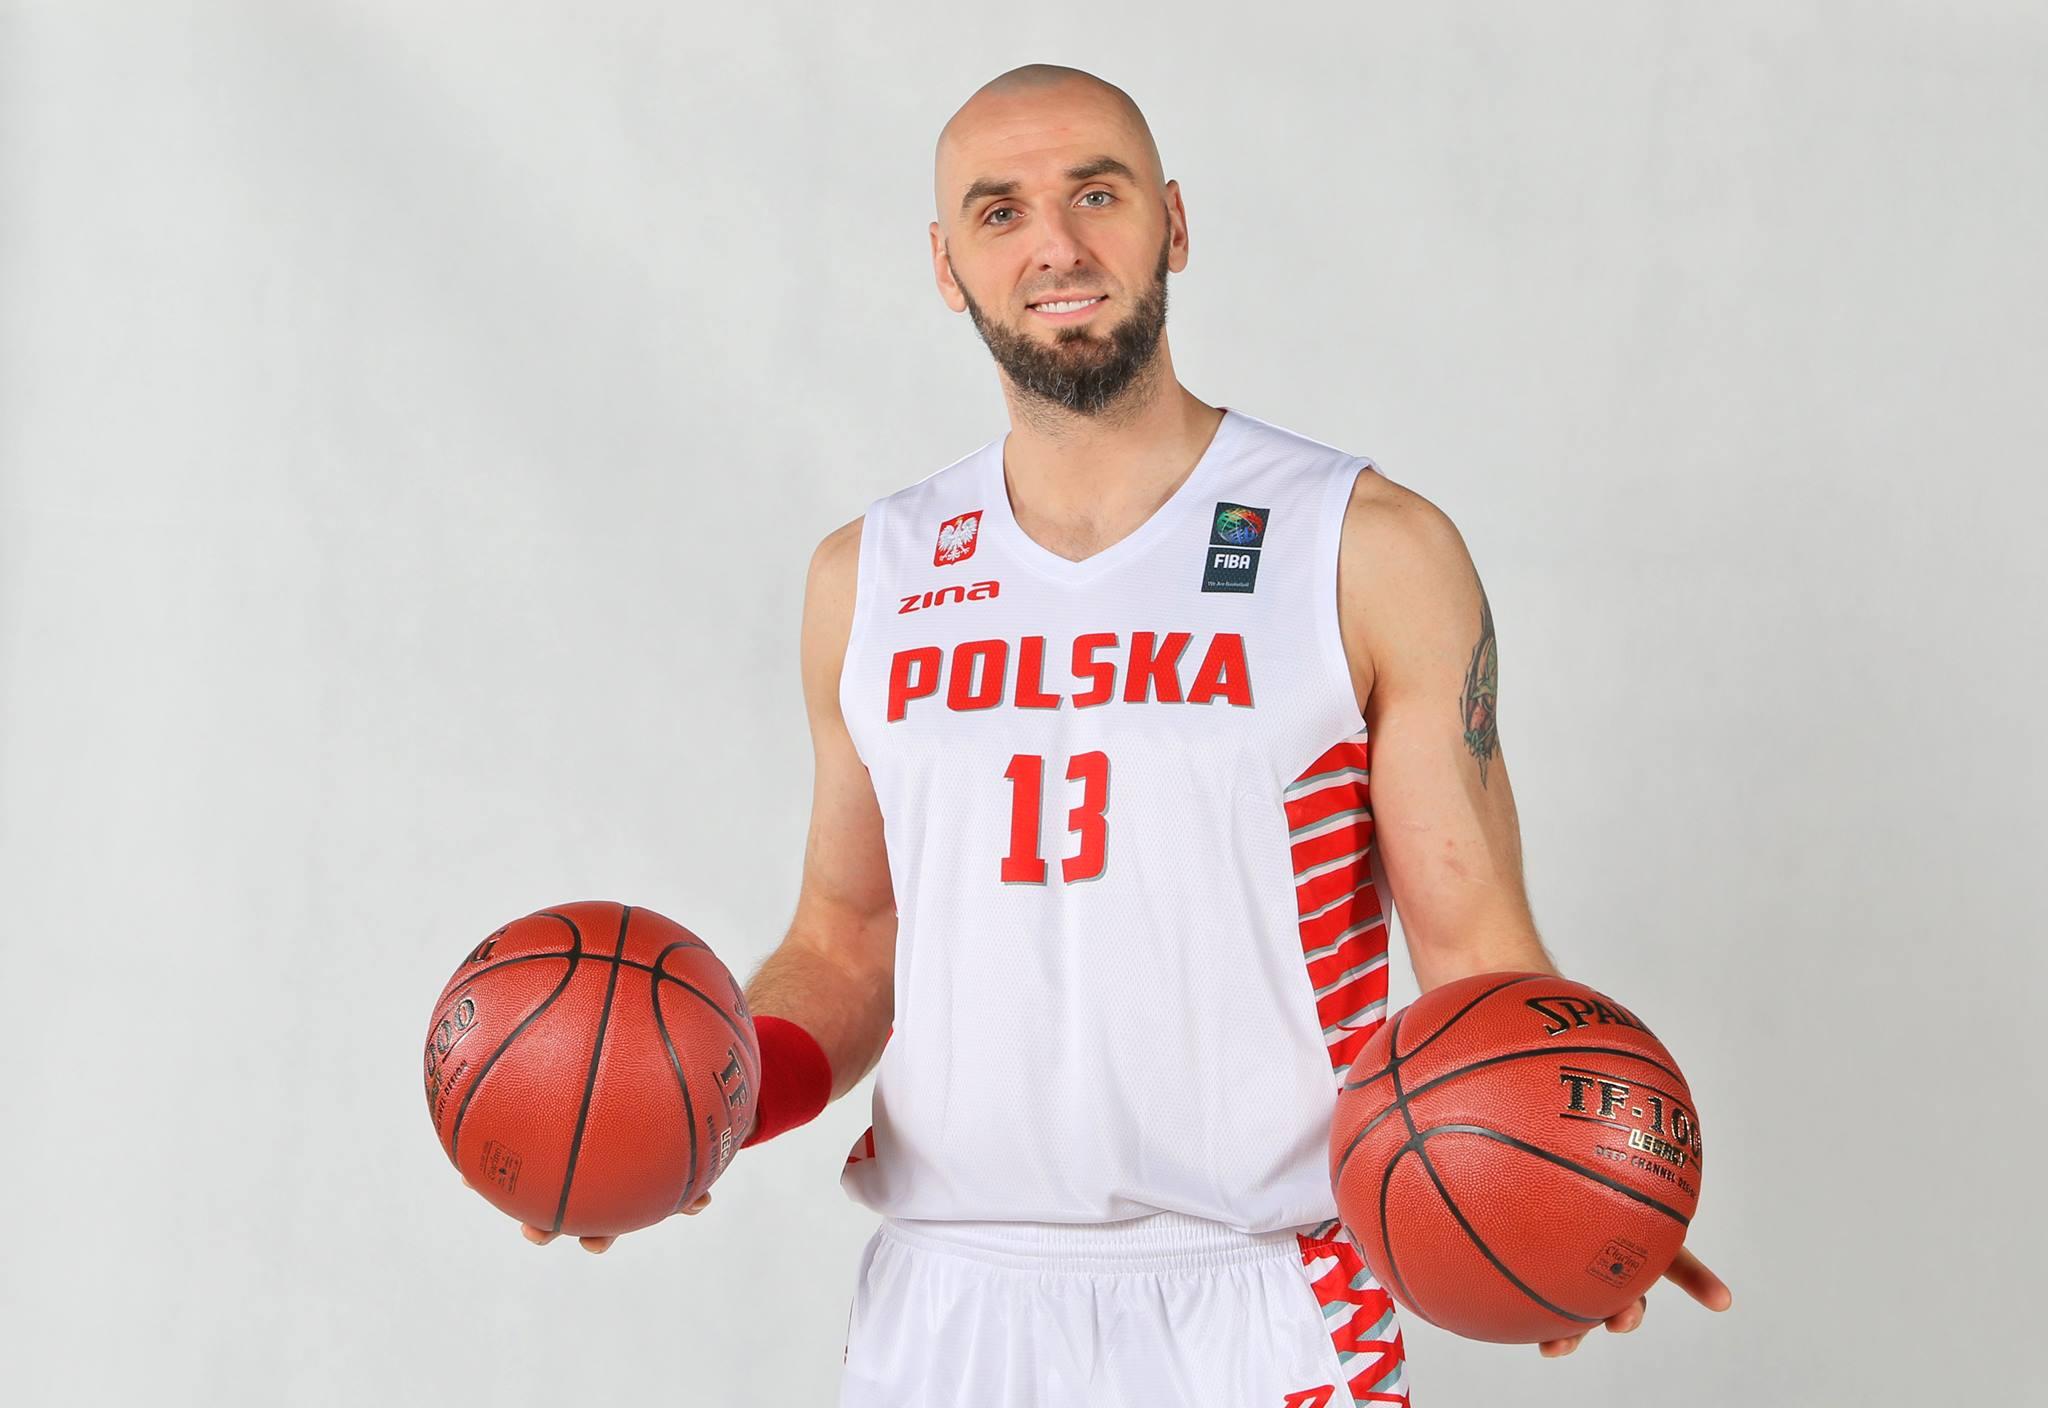 2. Marcin Gortat[Koszykówka- Washington Wizards]